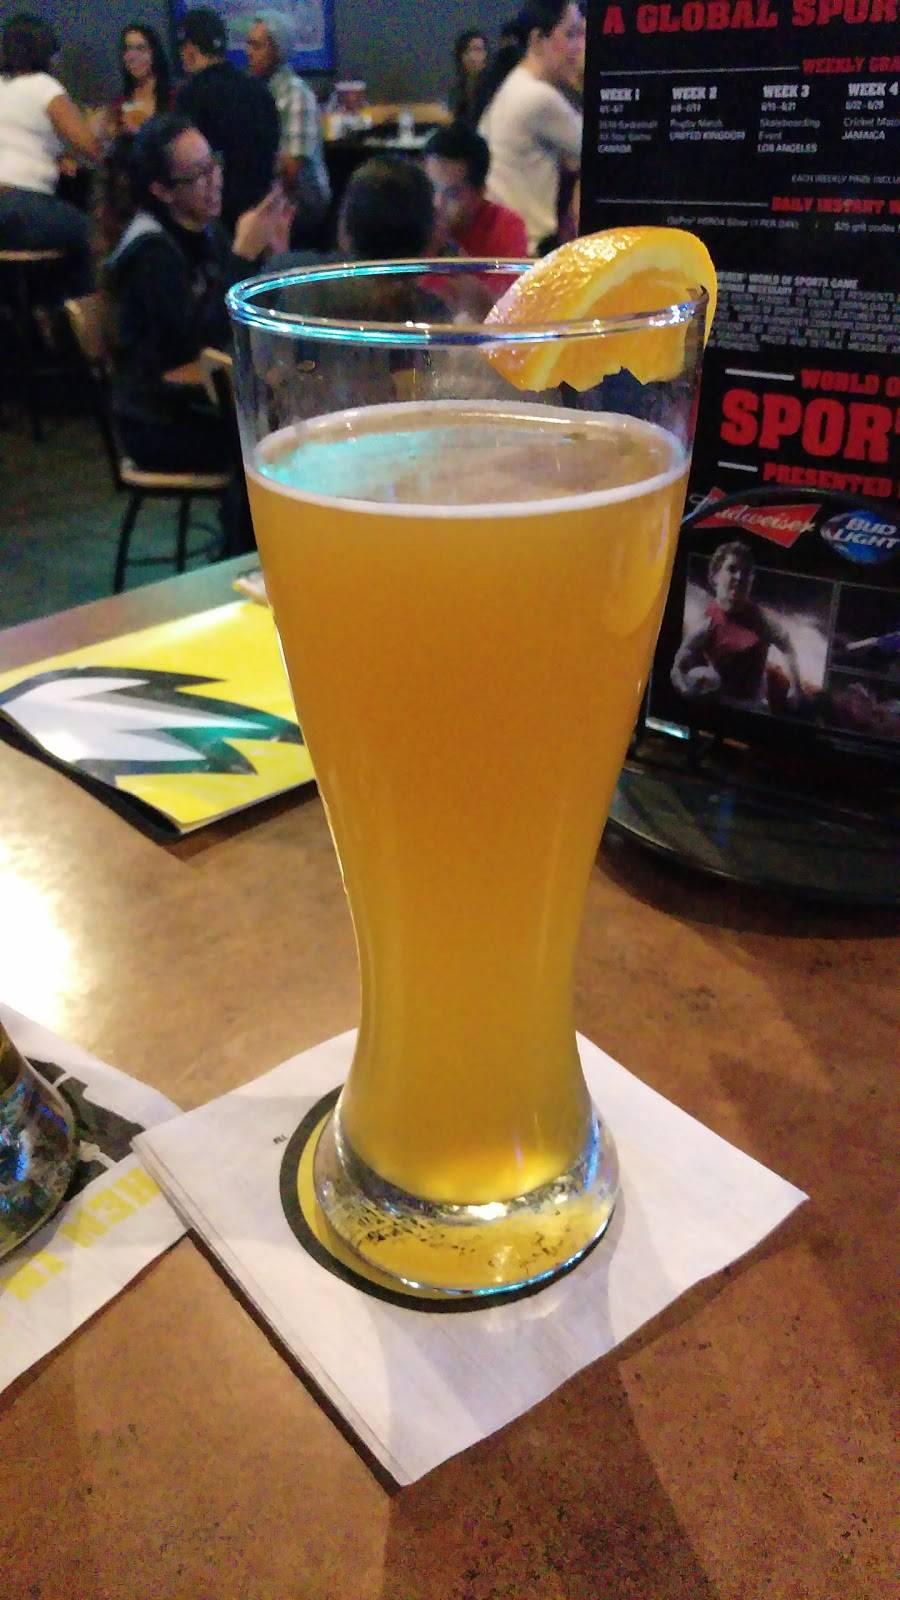 Buffalo Wild Wings | restaurant | 11255 E, 183rd St, Cerritos, CA 90703, USA | 5628659464 OR +1 562-865-9464